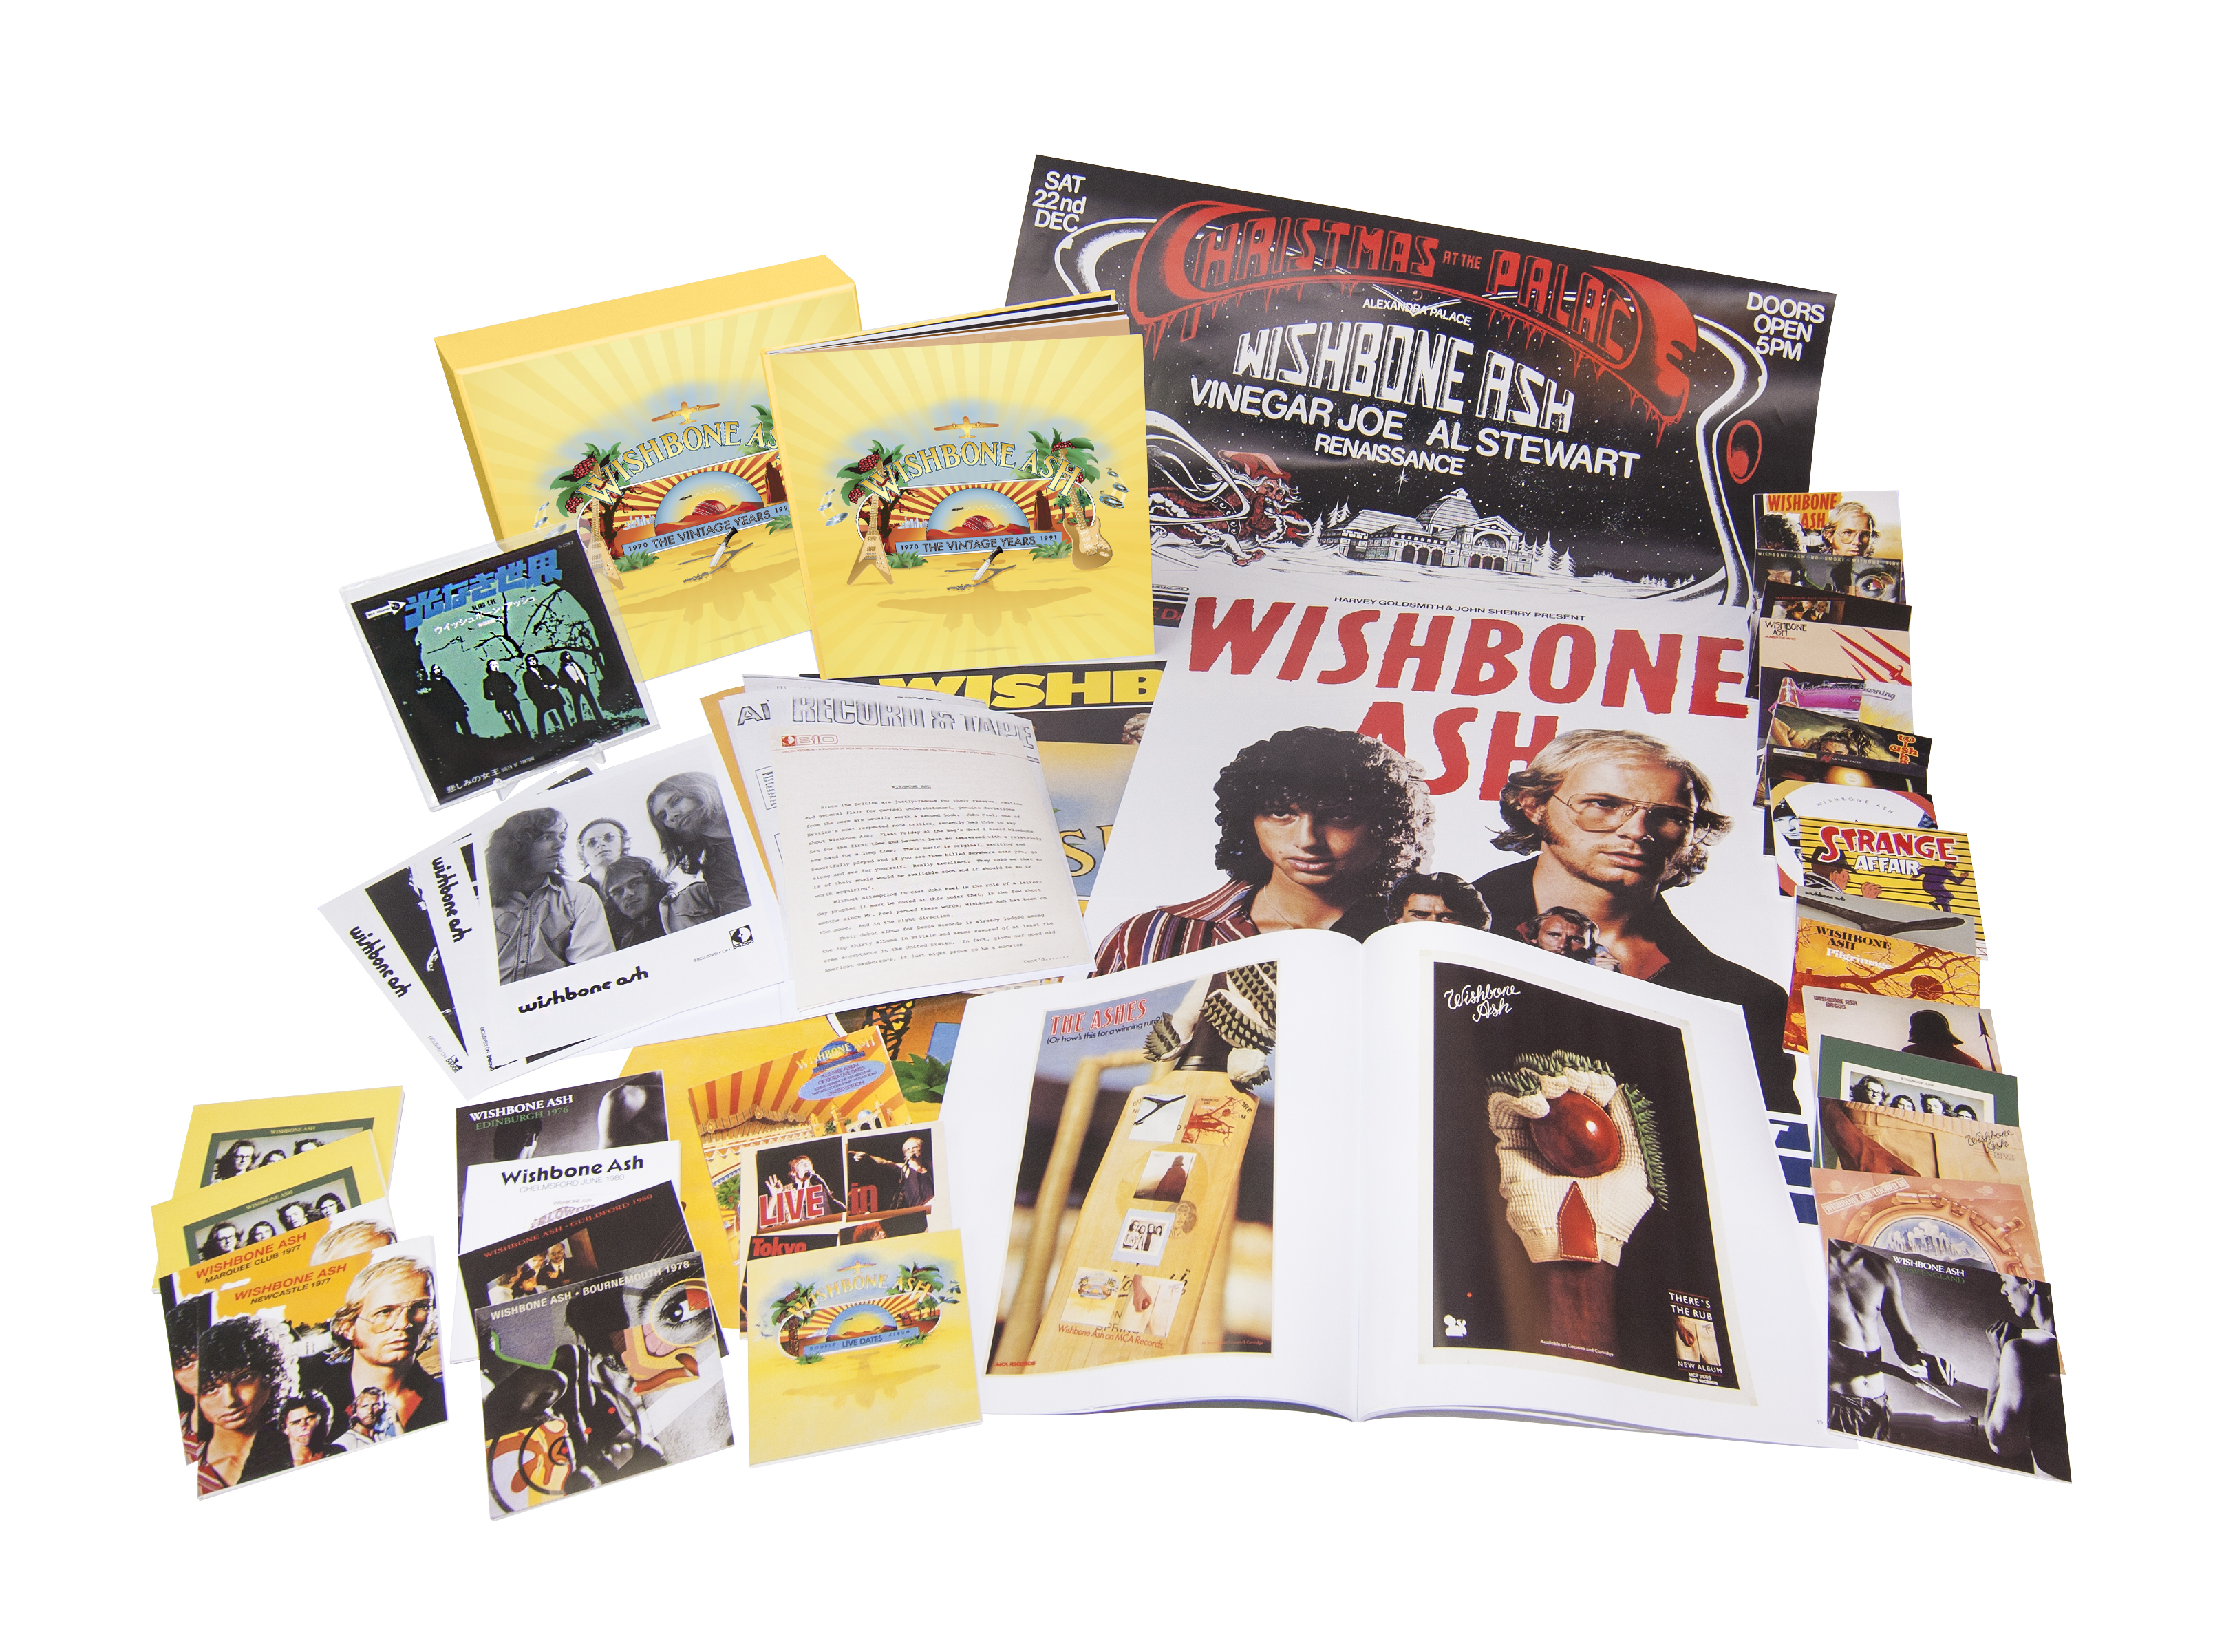 Wishbone Ash: The Vintage Years 1970 - 1991